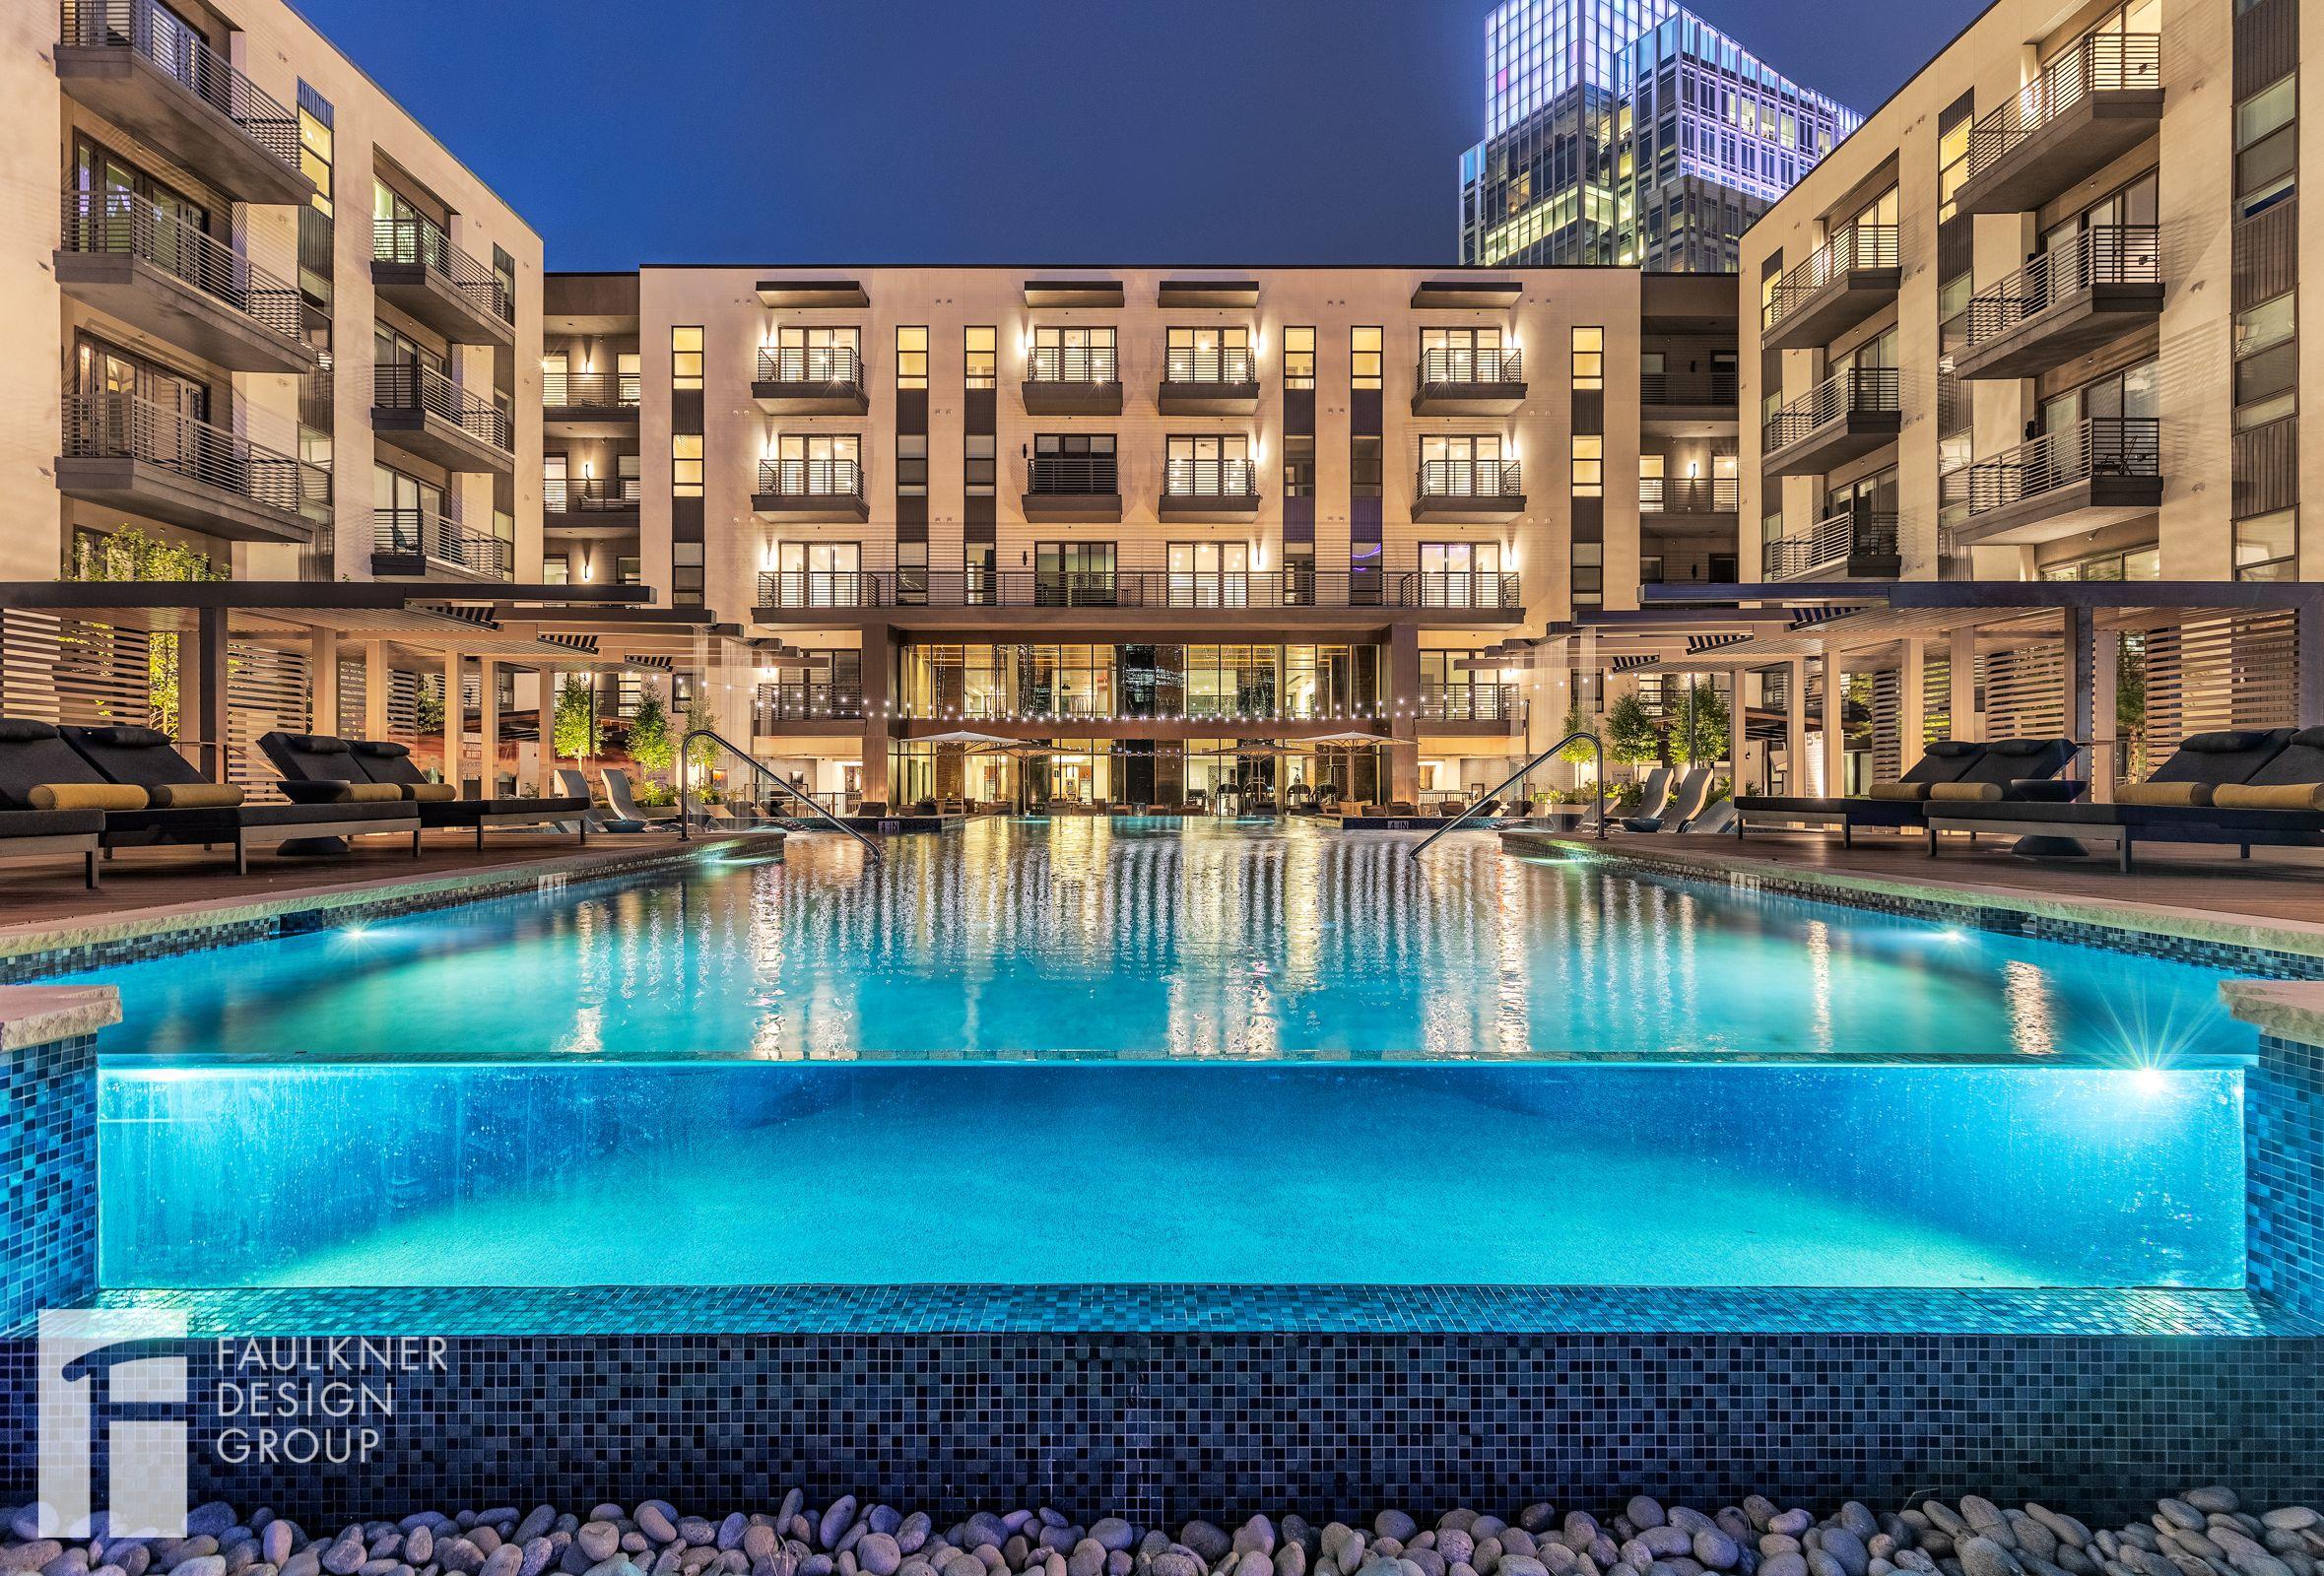 Designed By Faulkner Design Group Infinitypool Outdoorlounge Amenityspace Loungearea Luxurypool Luxury Pool Glass Pool Outdoor Pool